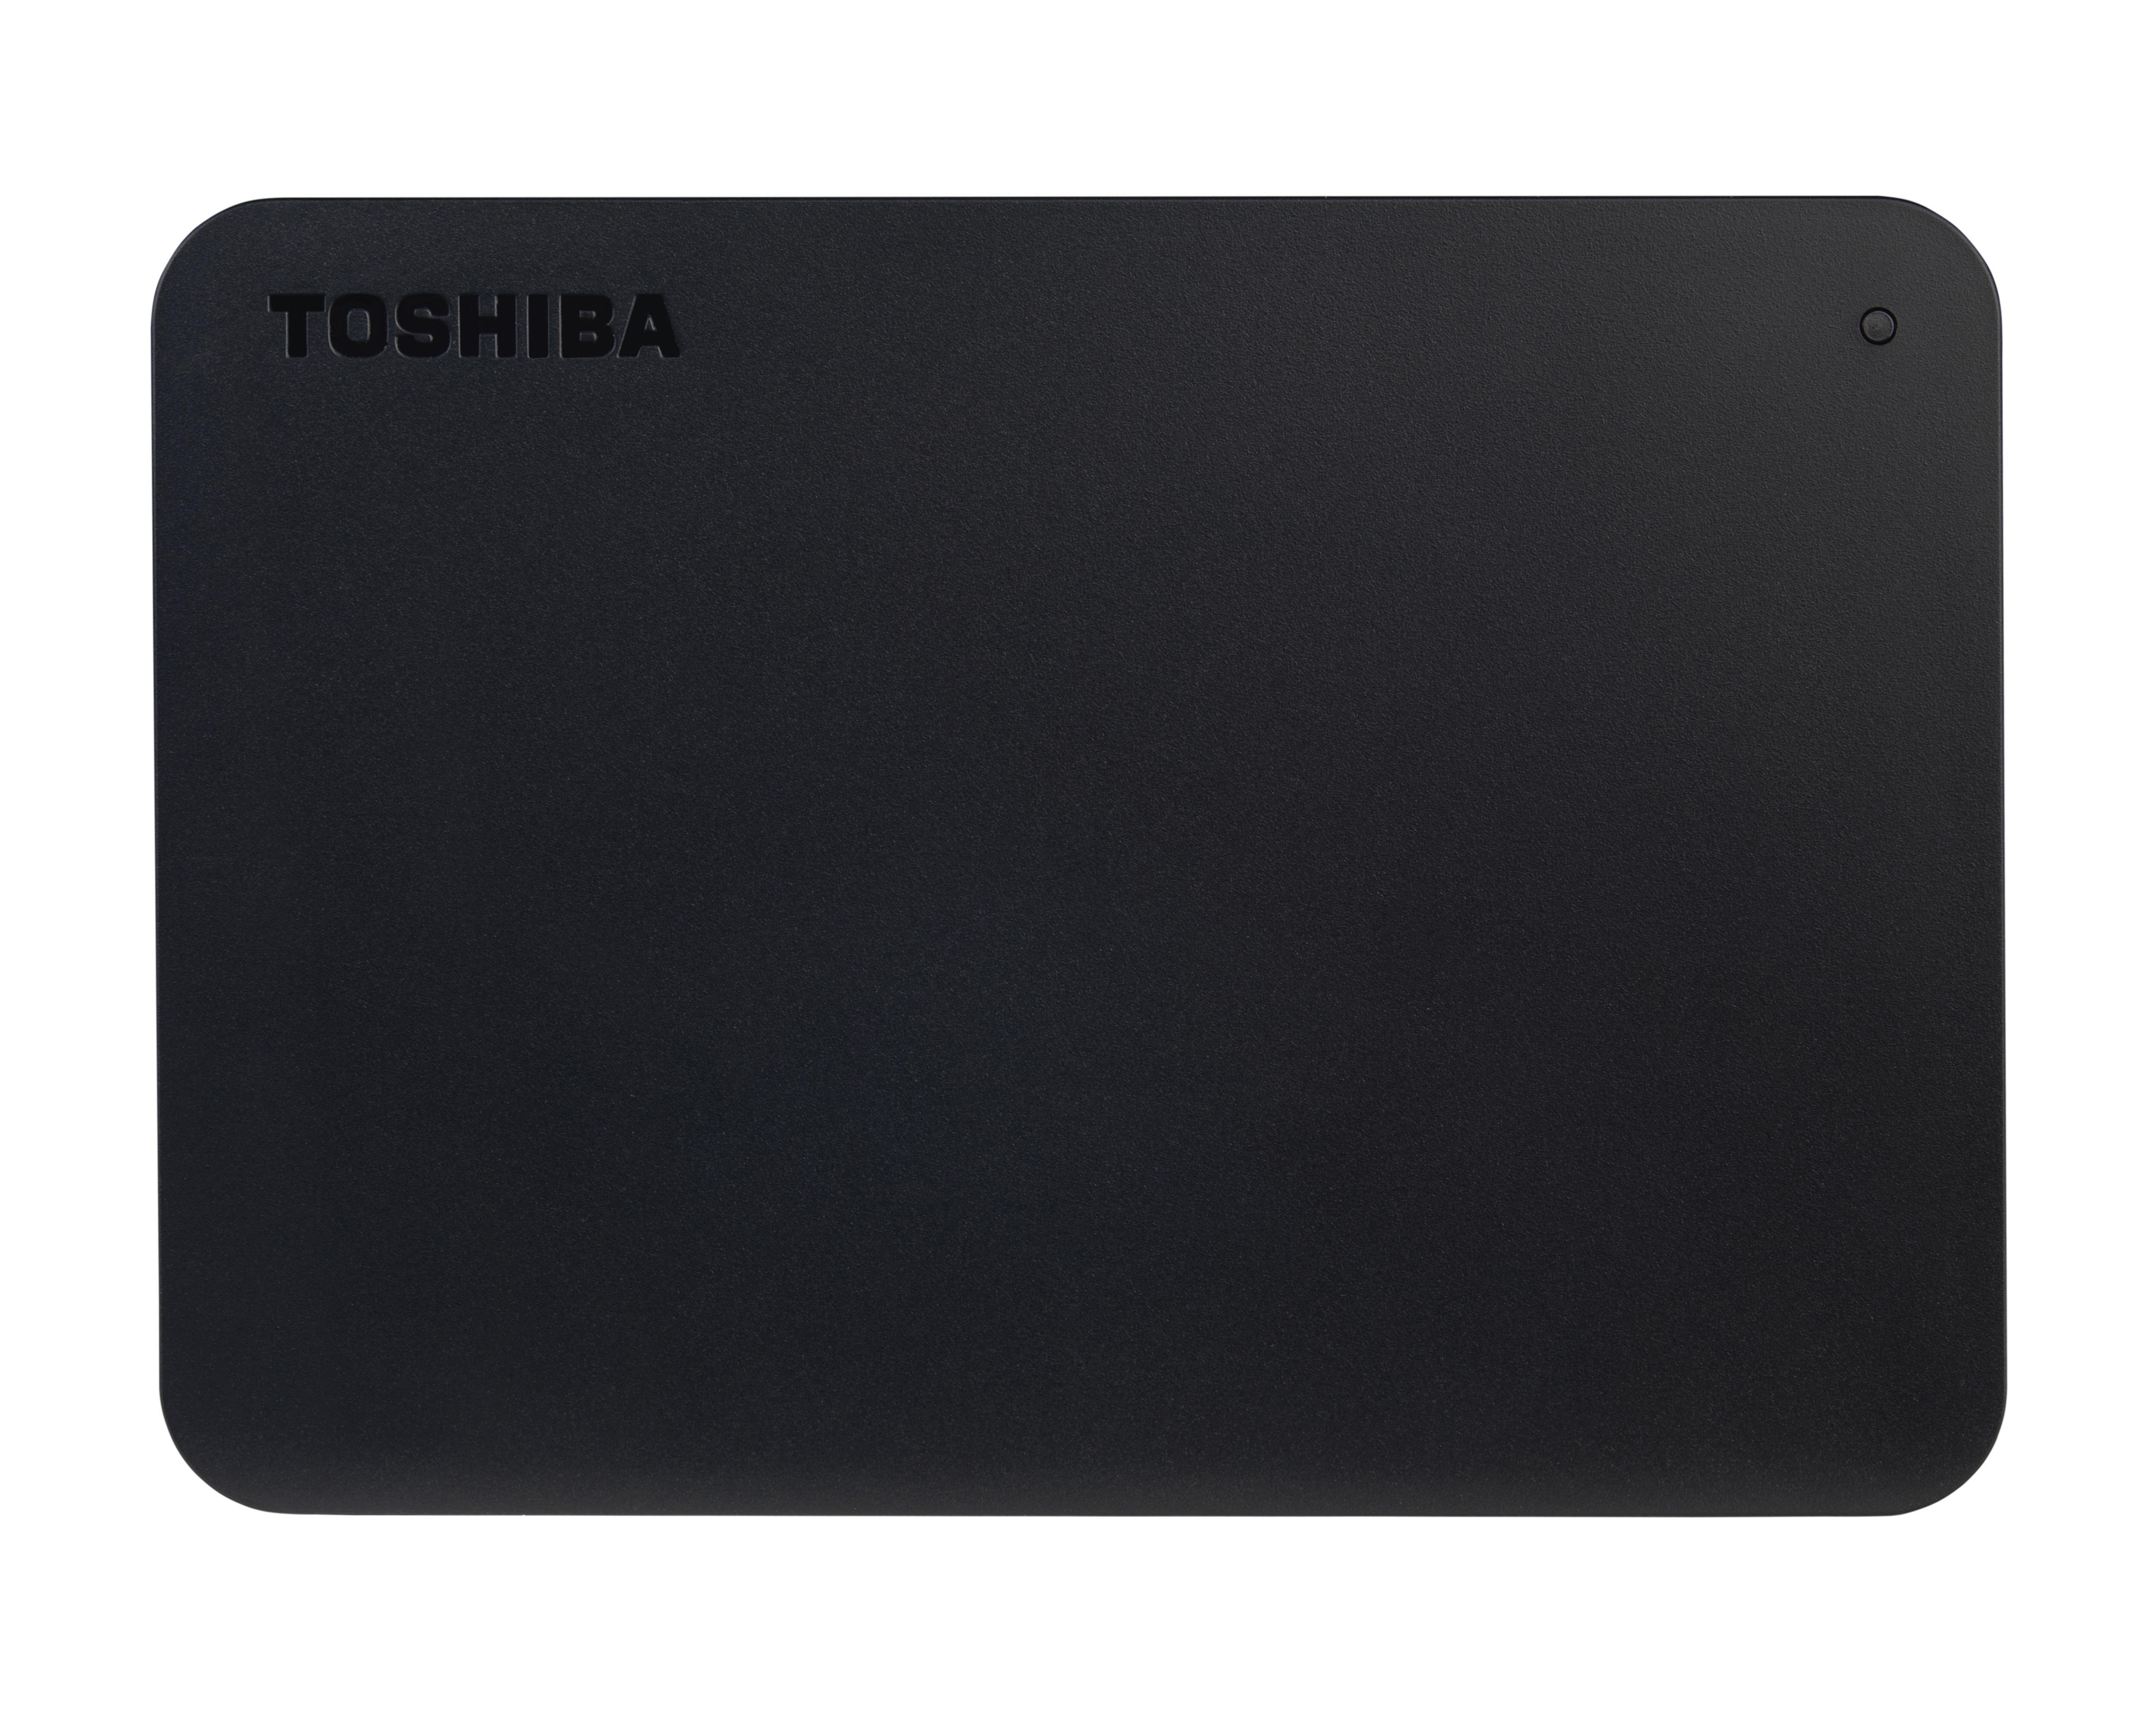 Toshiba Dynabook HDTB420EK3AA disco rigido esterno 2000 GB Nero